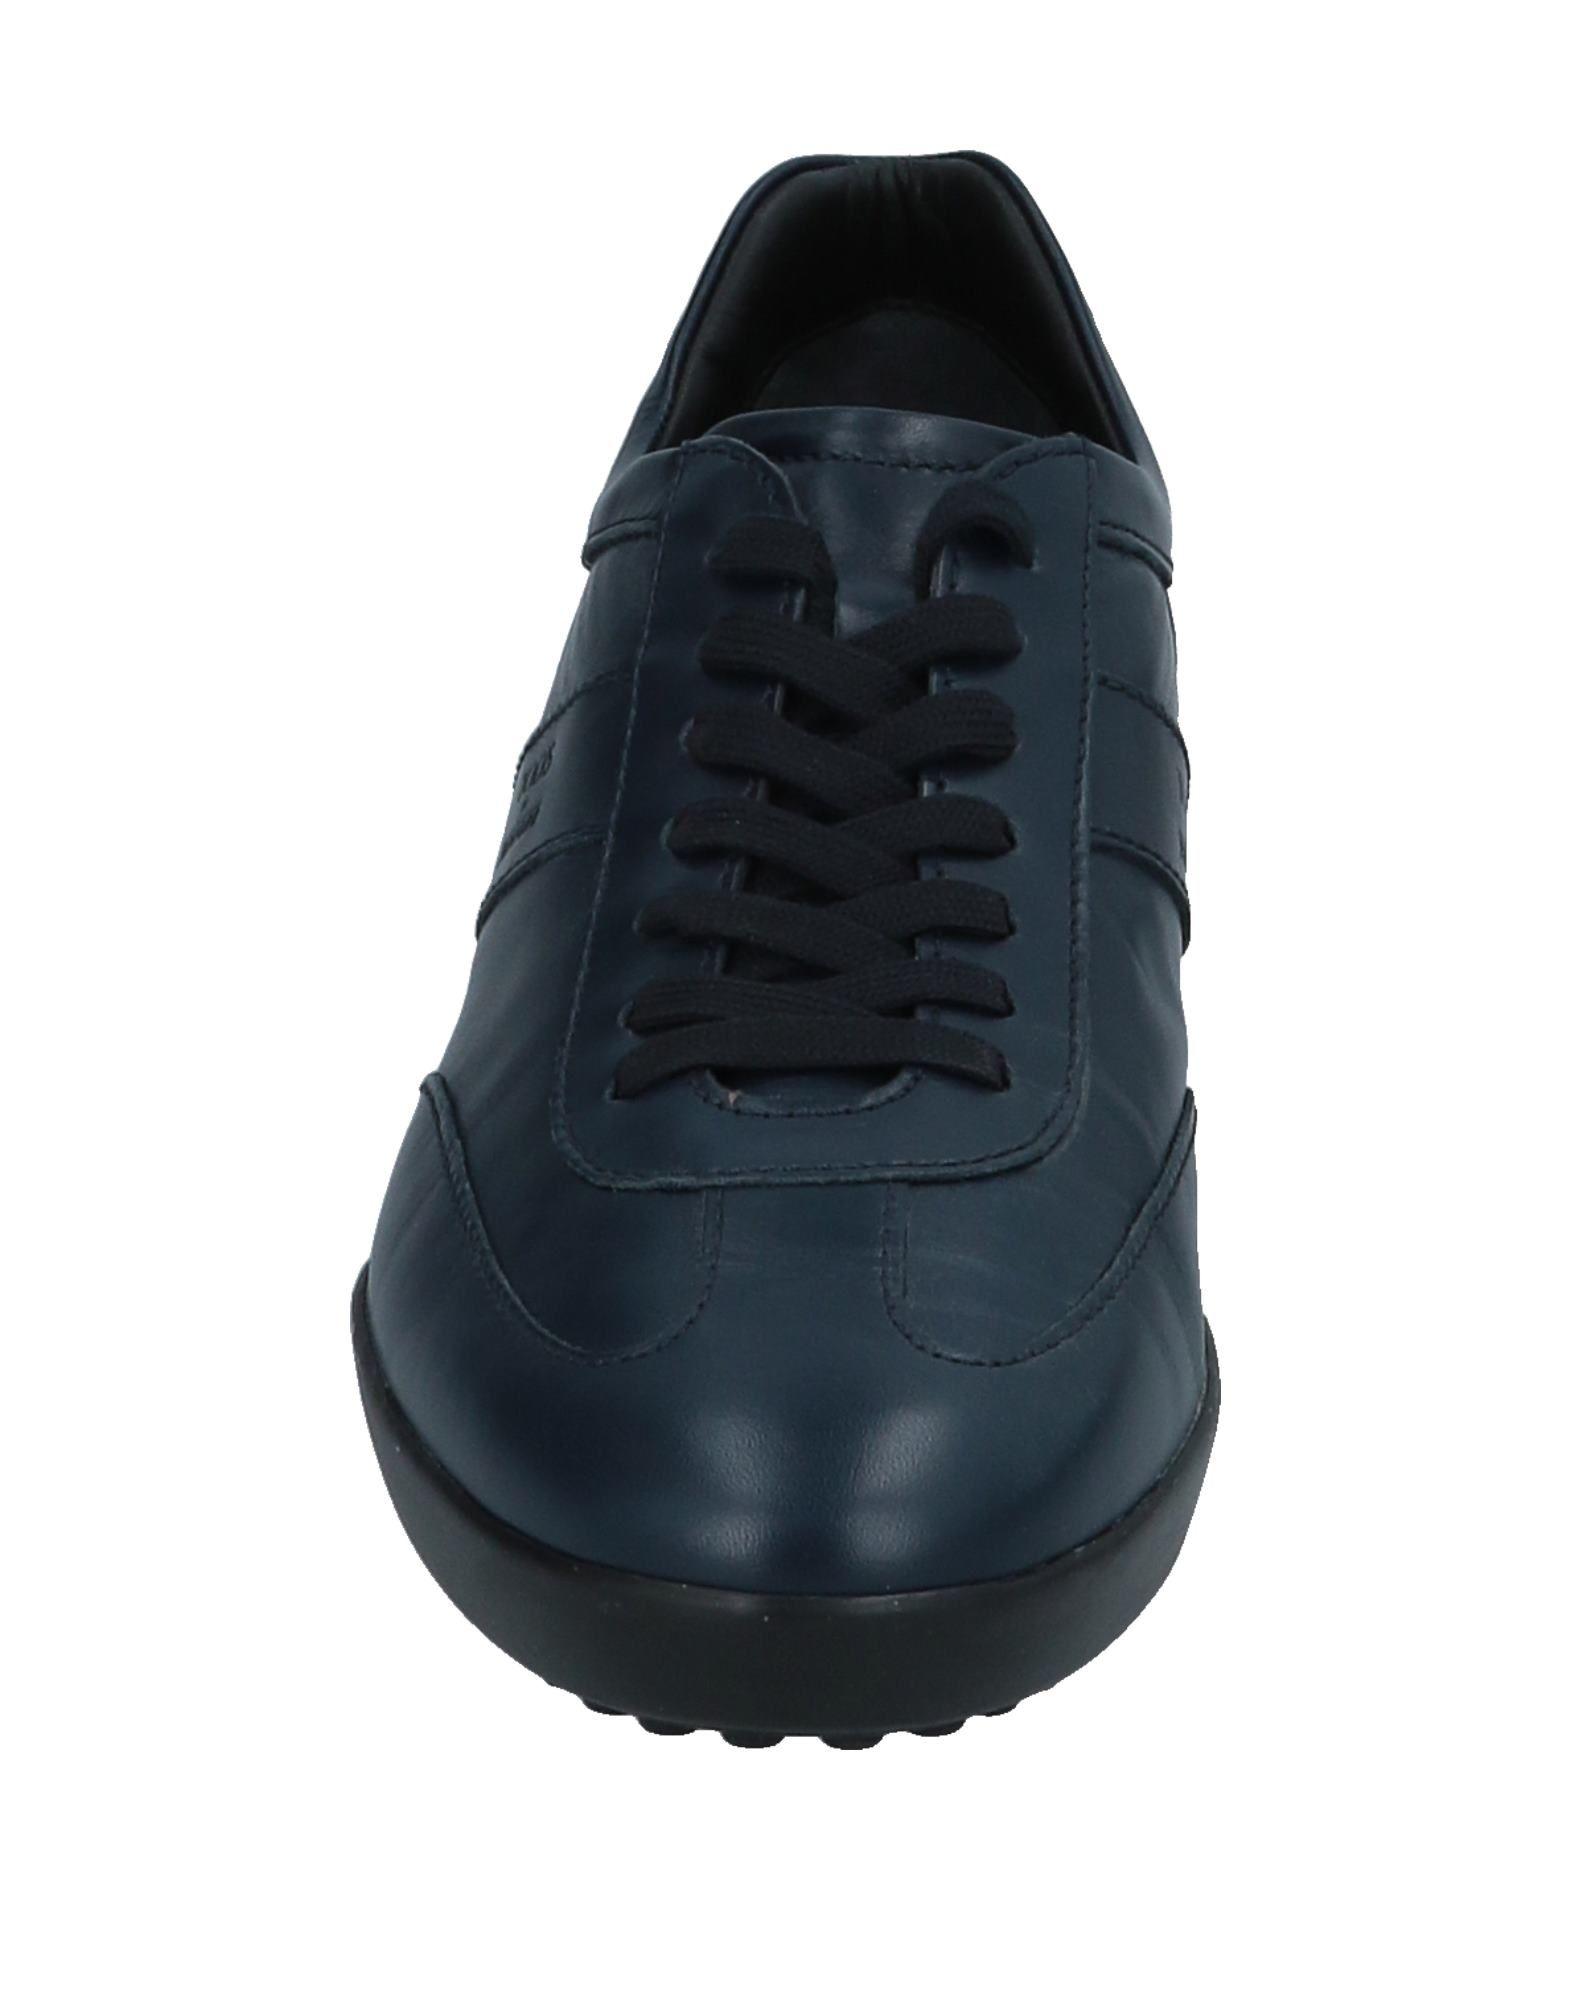 Tod's 11542784OI For Ferrari Sneakers Herren  11542784OI Tod's Gute Qualität beliebte Schuhe 6162f5